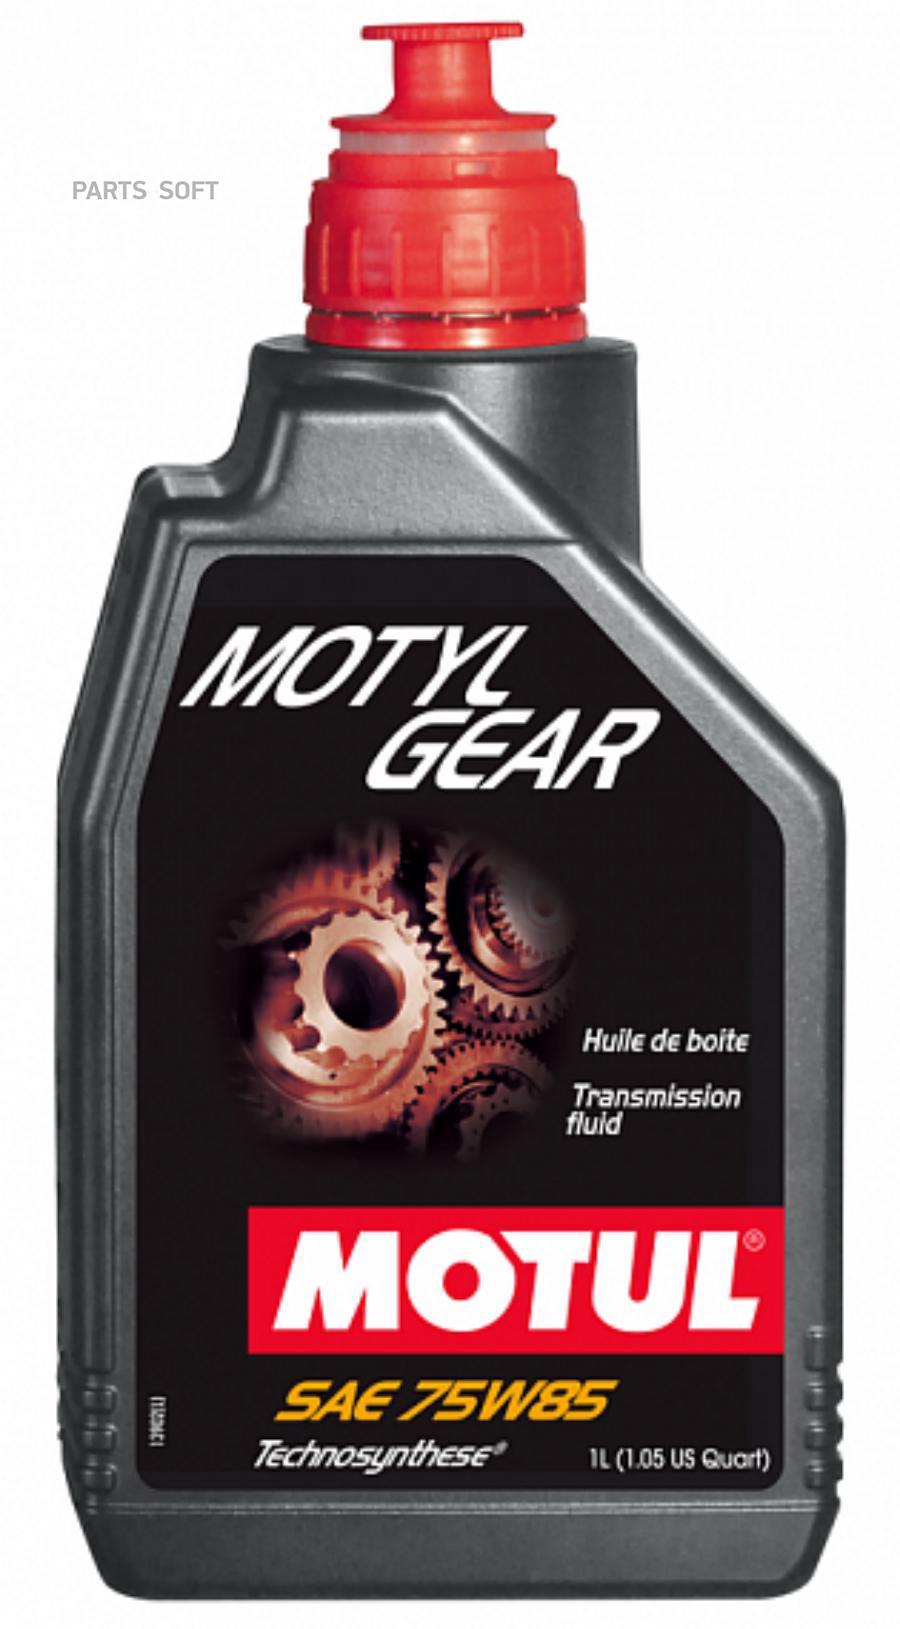 MOTUL Motylgear 75W-85 GL-4/5 (синт) 1л масло трансмиссионное (12)